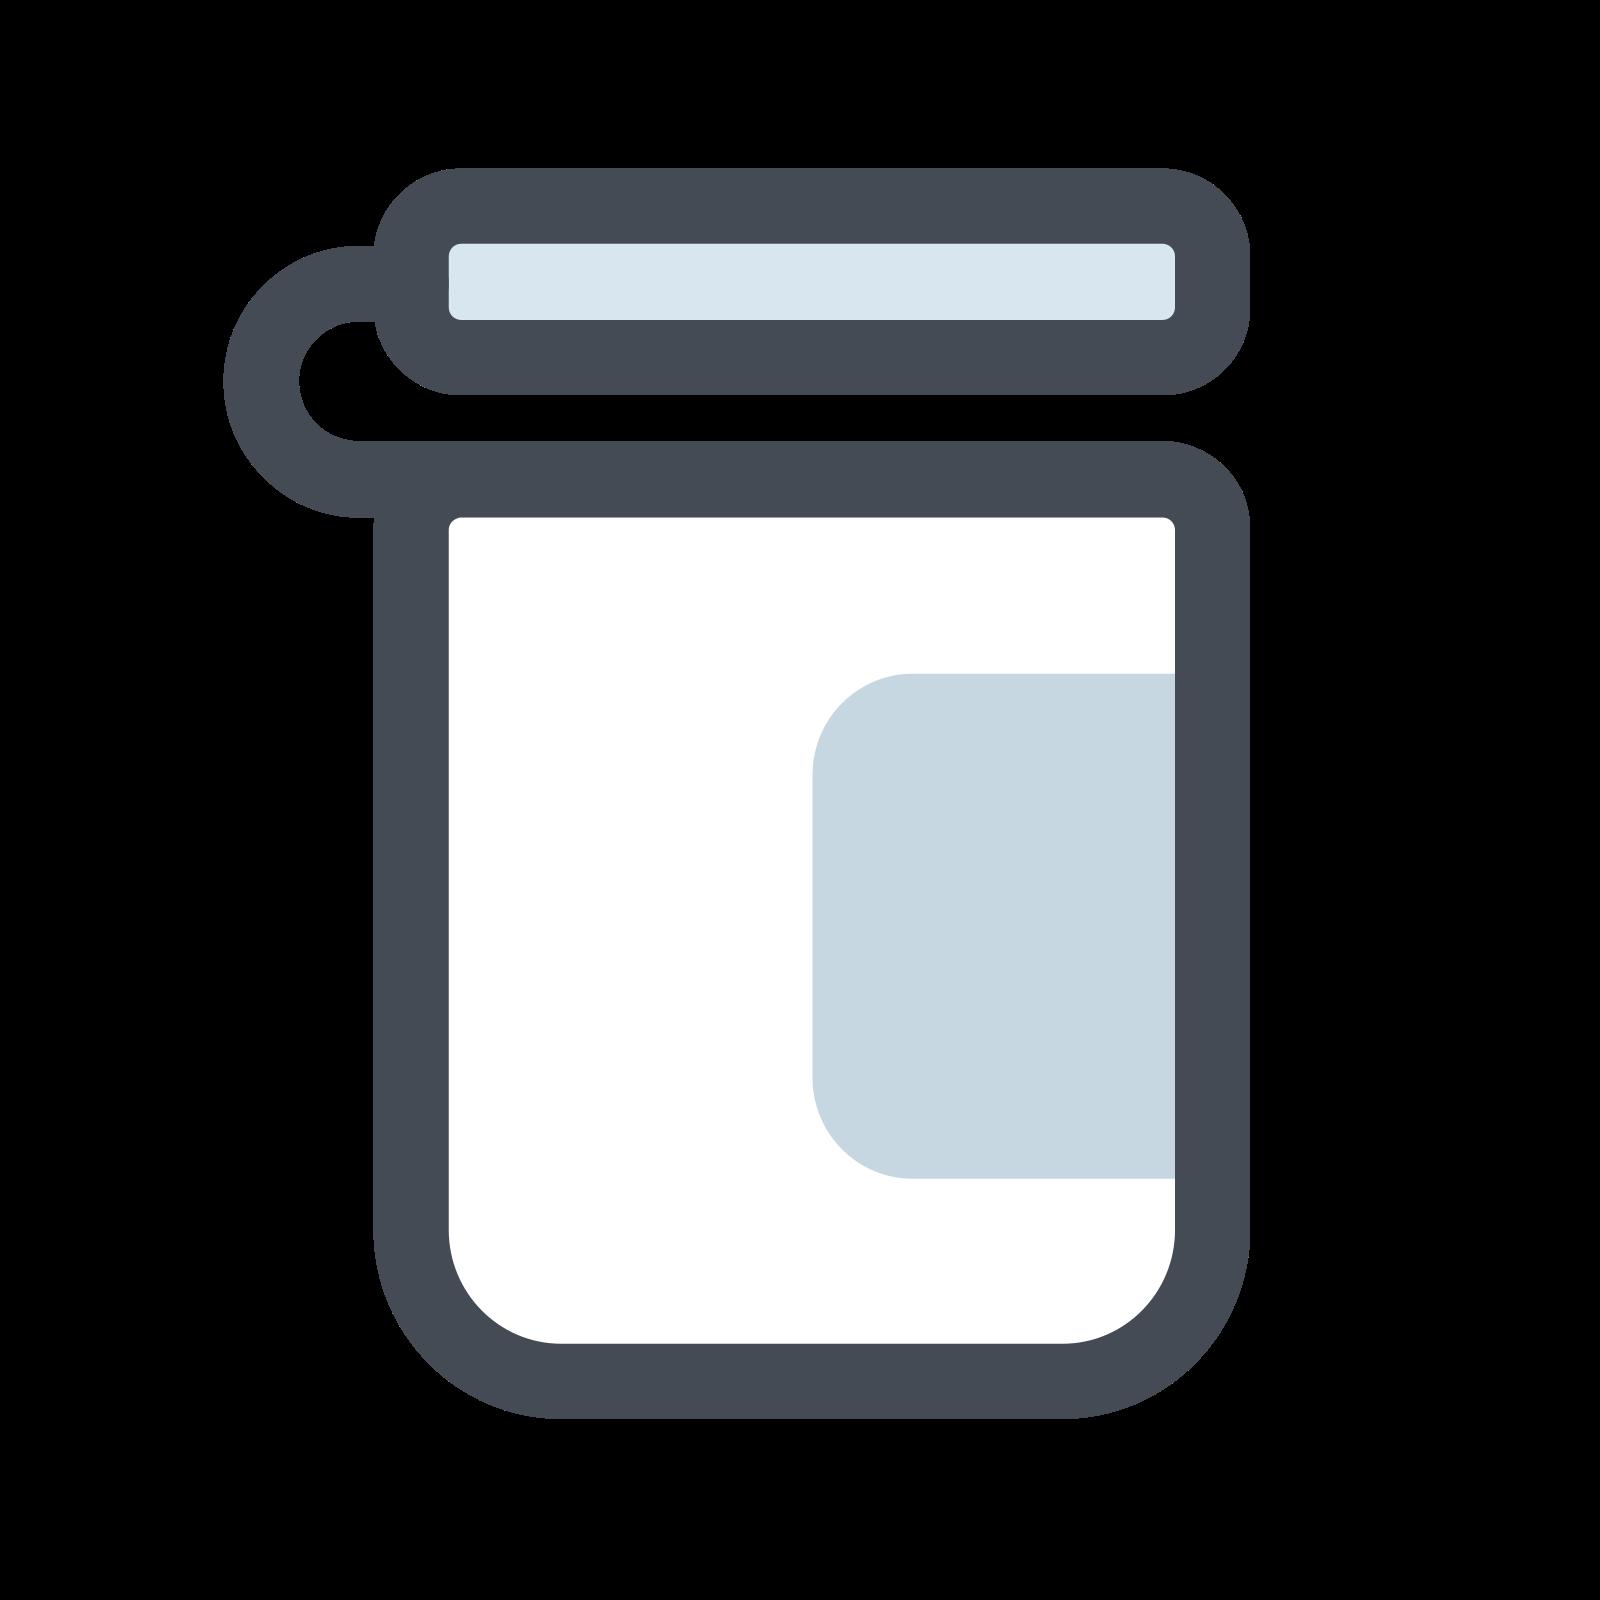 Pill Bottle icon